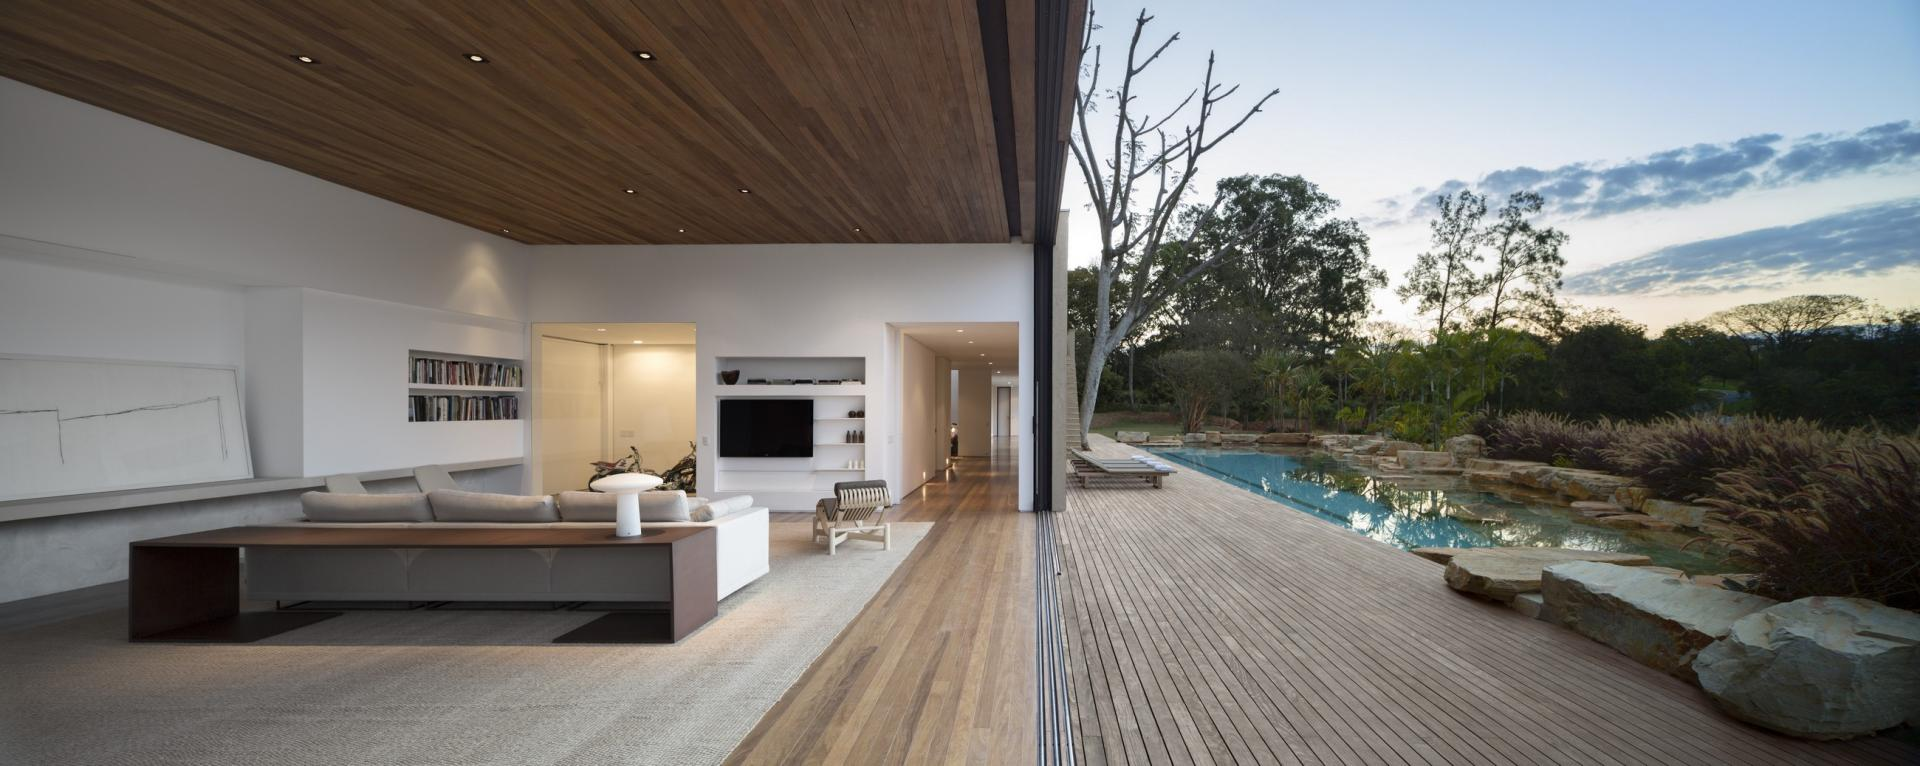 L shape ITU house near Sao Paulo by Studio Arthur Casas-18